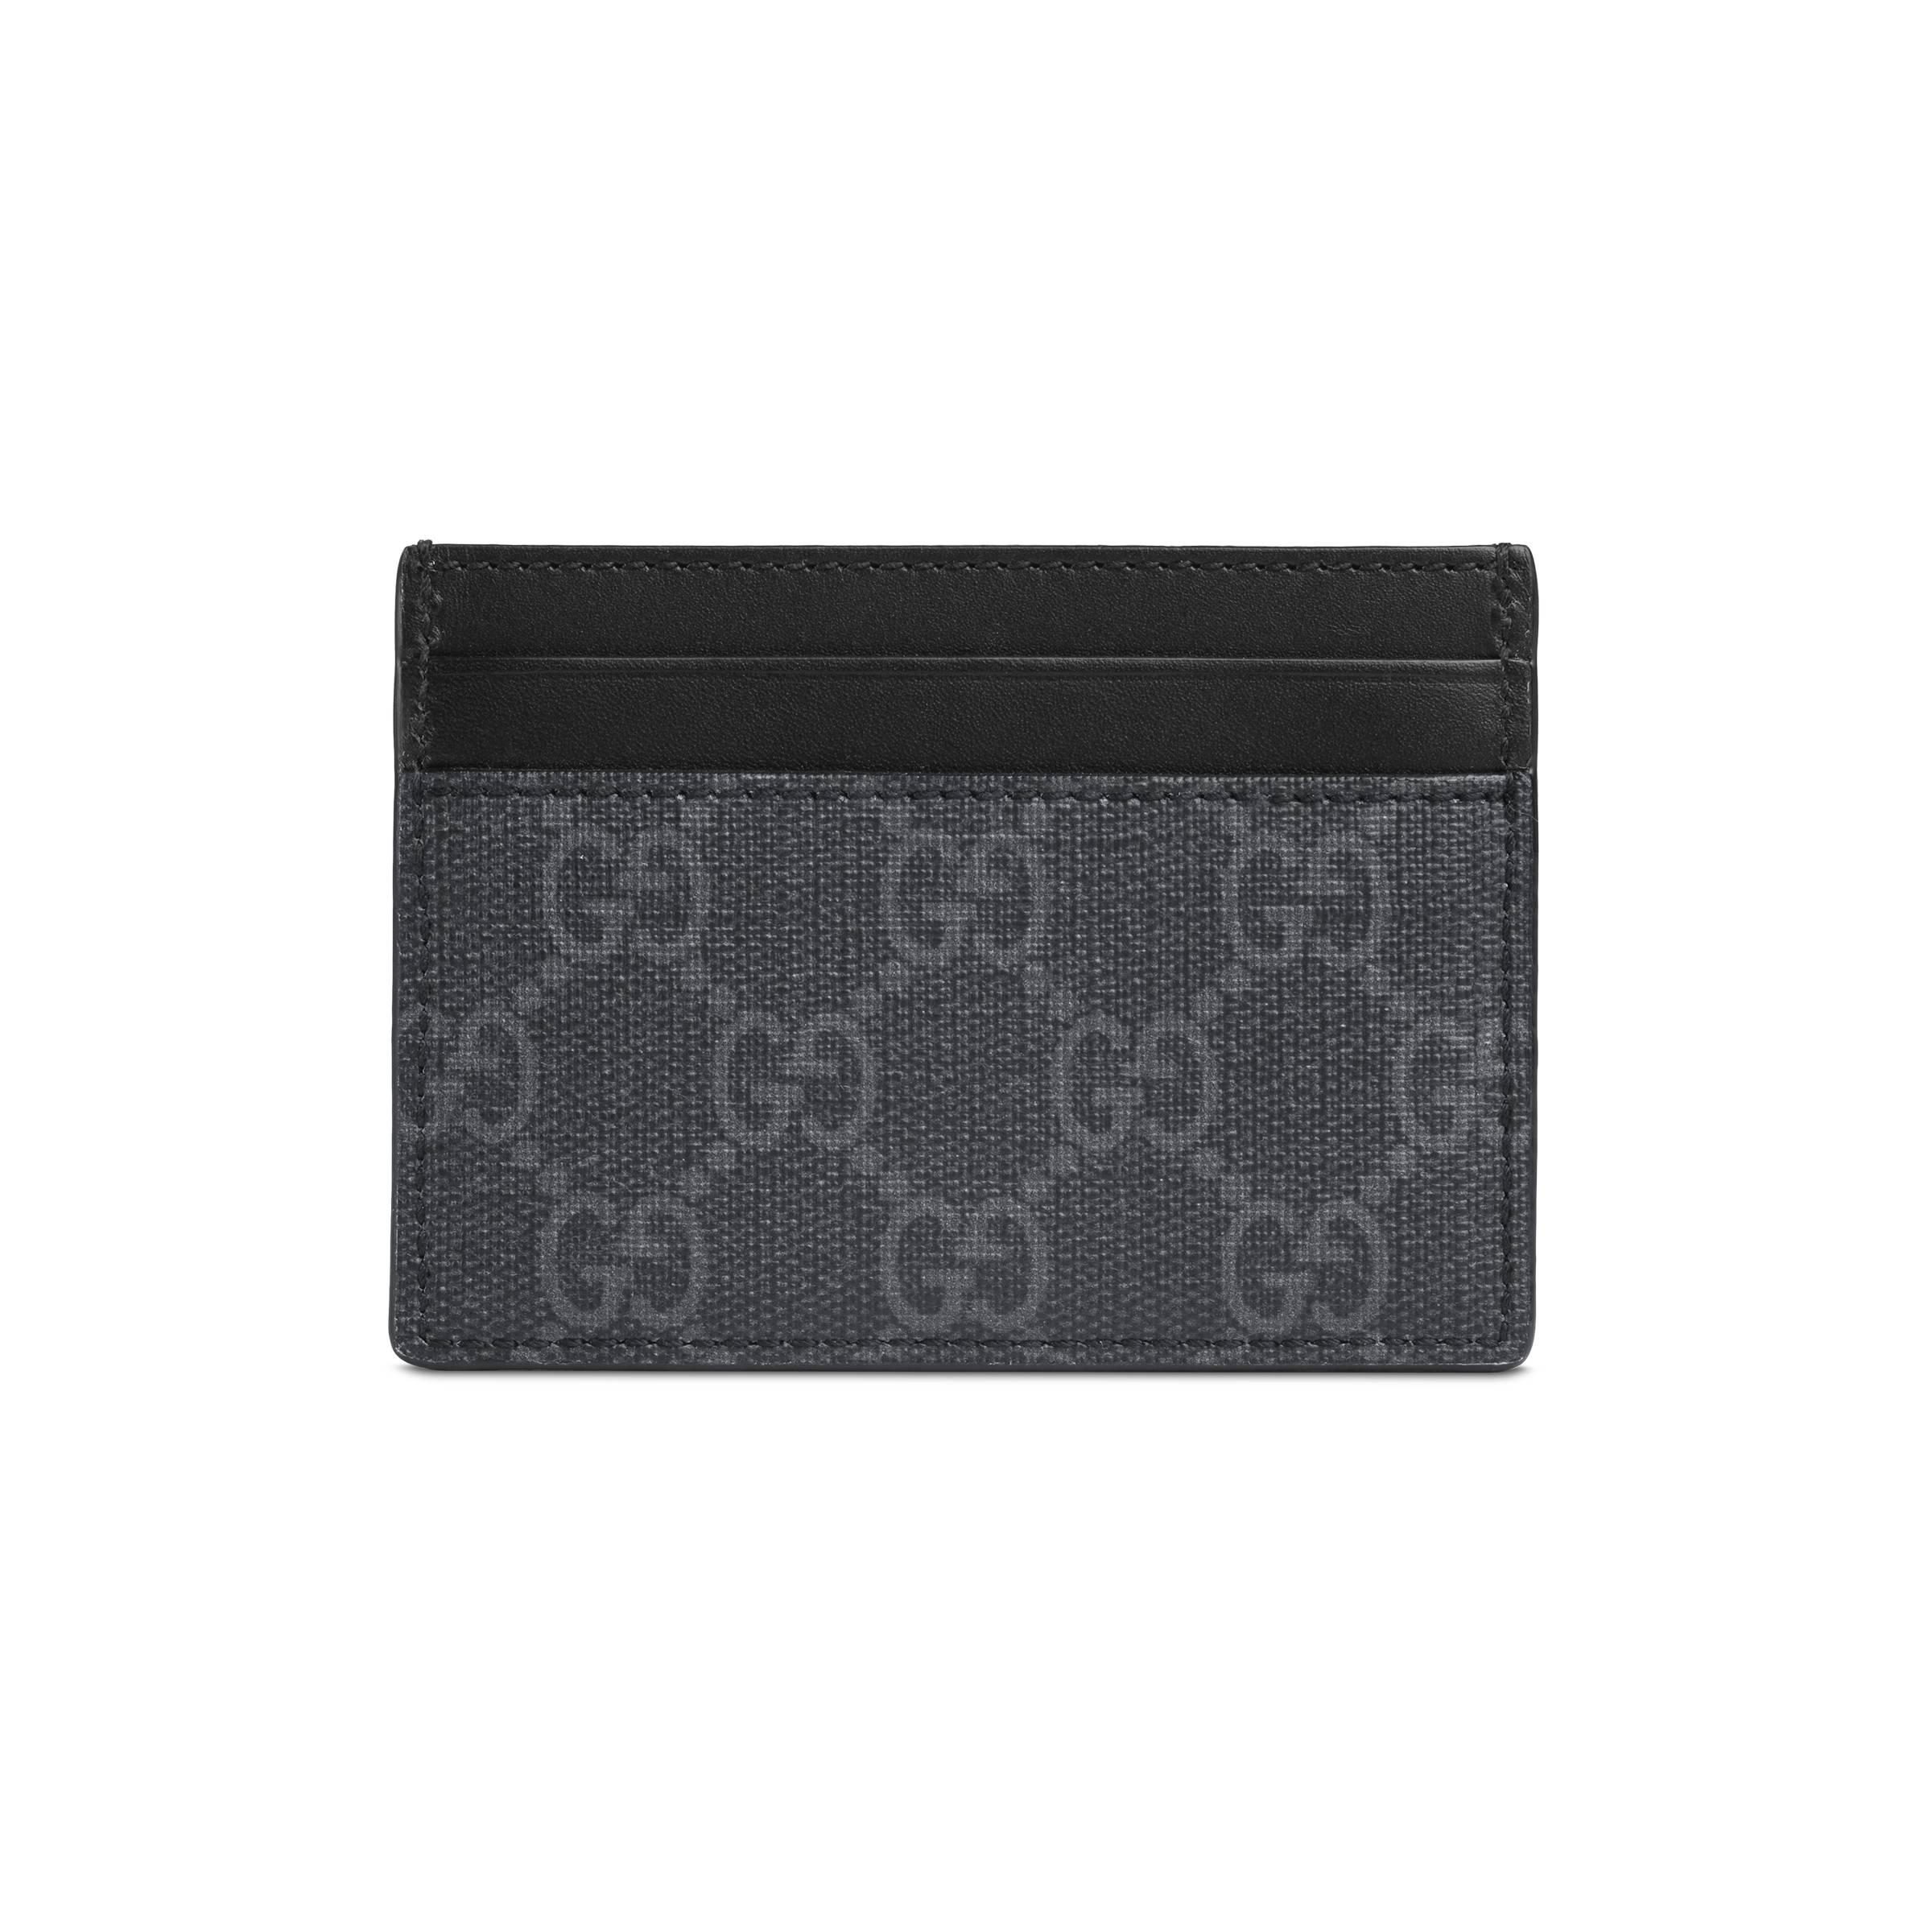 2c6b93a6d21 Gucci Kingsnake Print GG Supreme Card Case in Black for Men - Save 8 ...